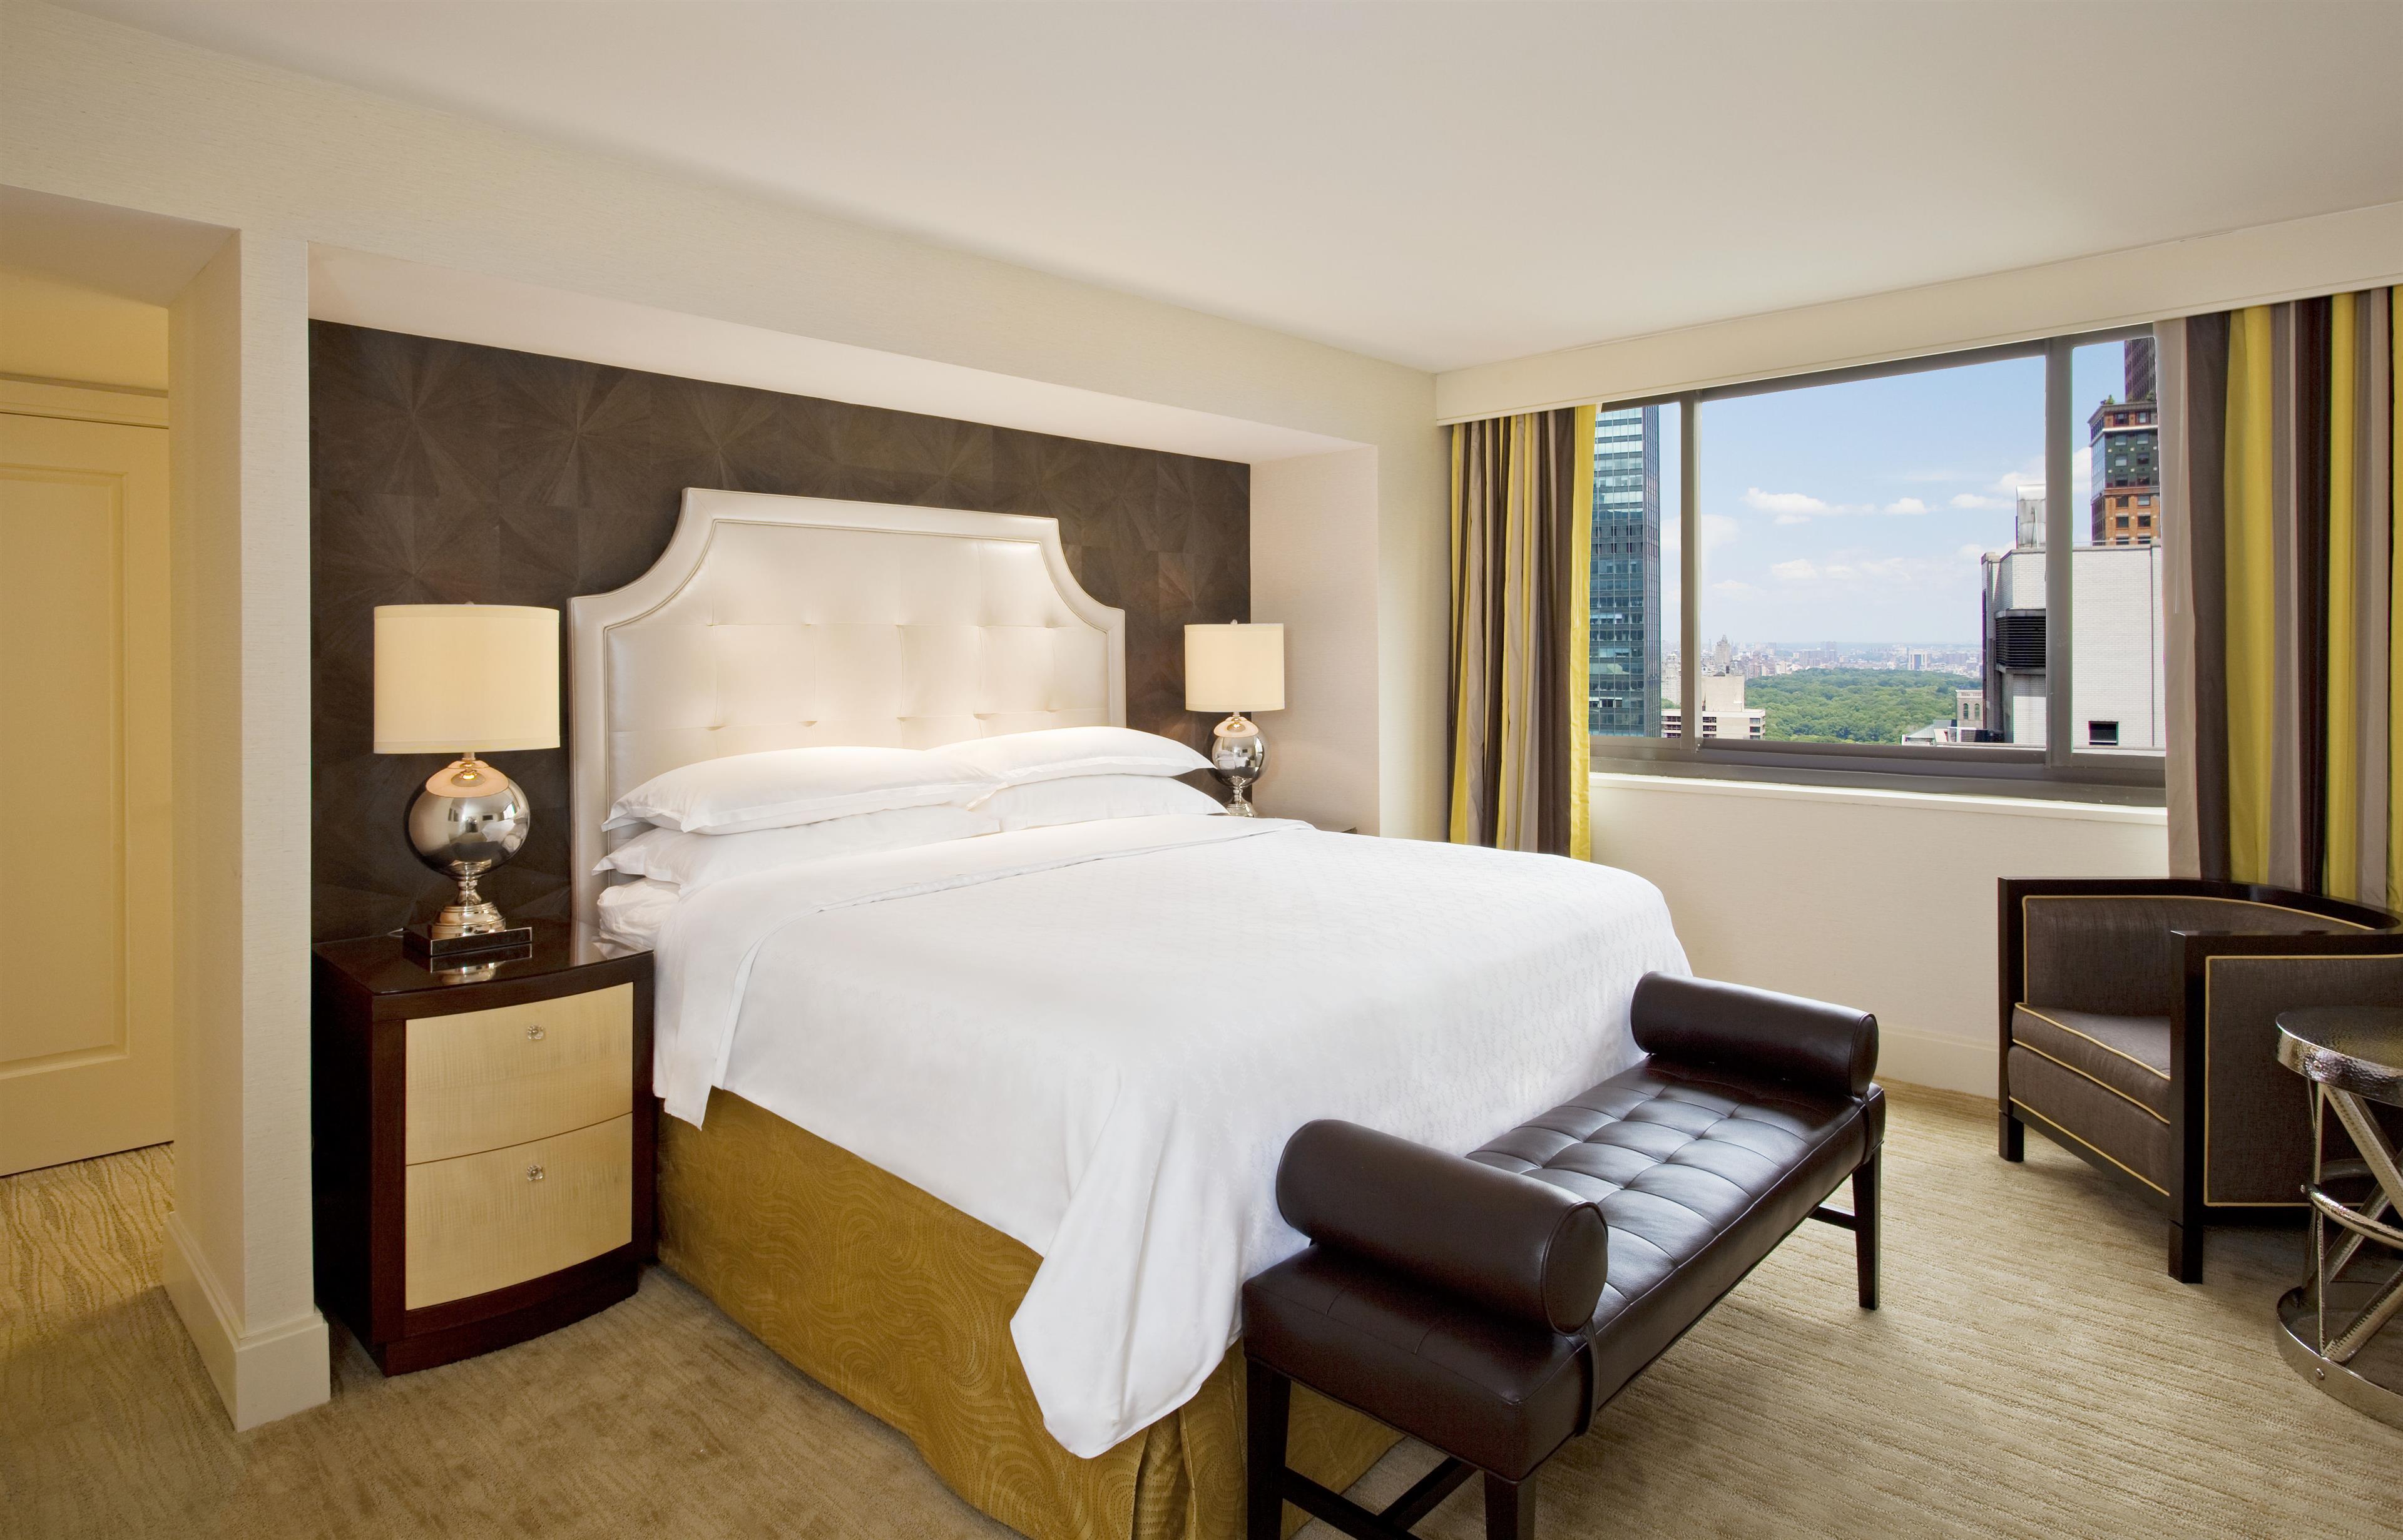 Sheraton New York Times Square Hotel image 10